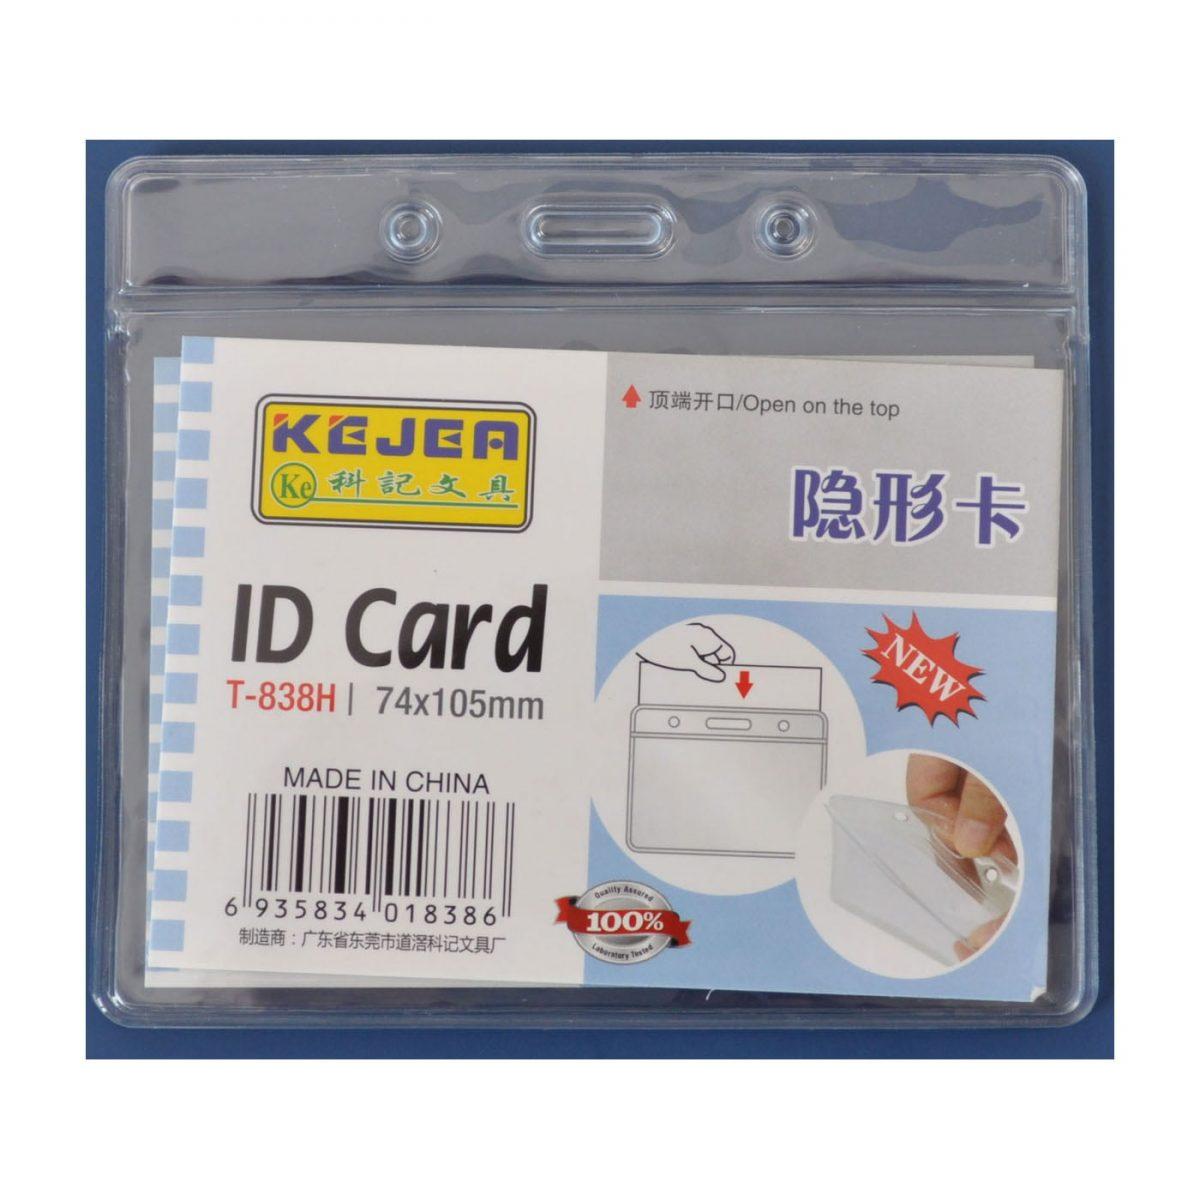 Buzunar PVC pentru ID carduri, 105 x 74mm, orizontal, 10 buc/set, KEJEA - cristal